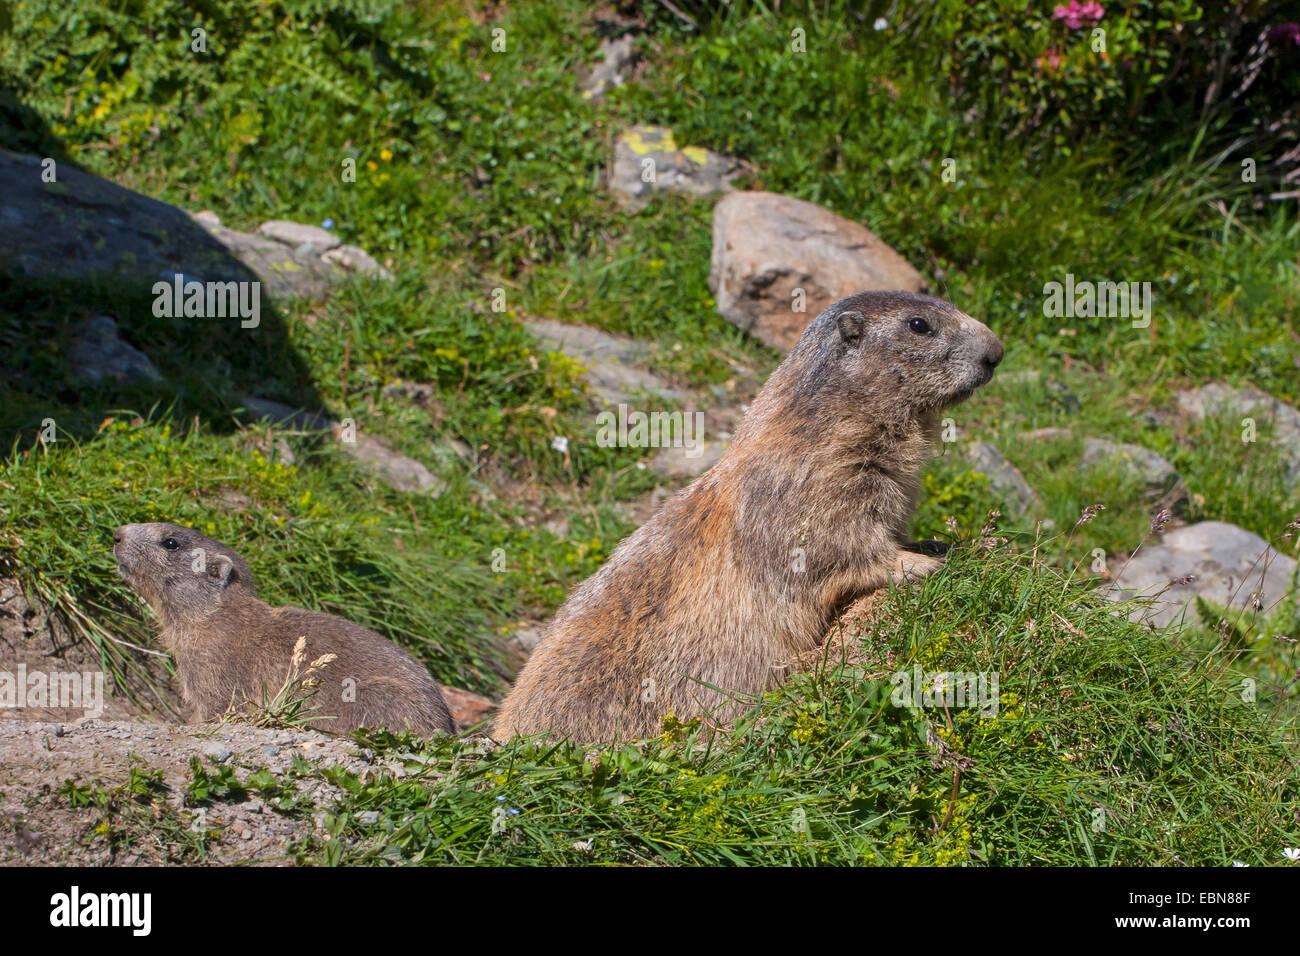 alpine marmot (Marmota marmota), marmots in front of their den, Switzerland, Valais - Stock Image